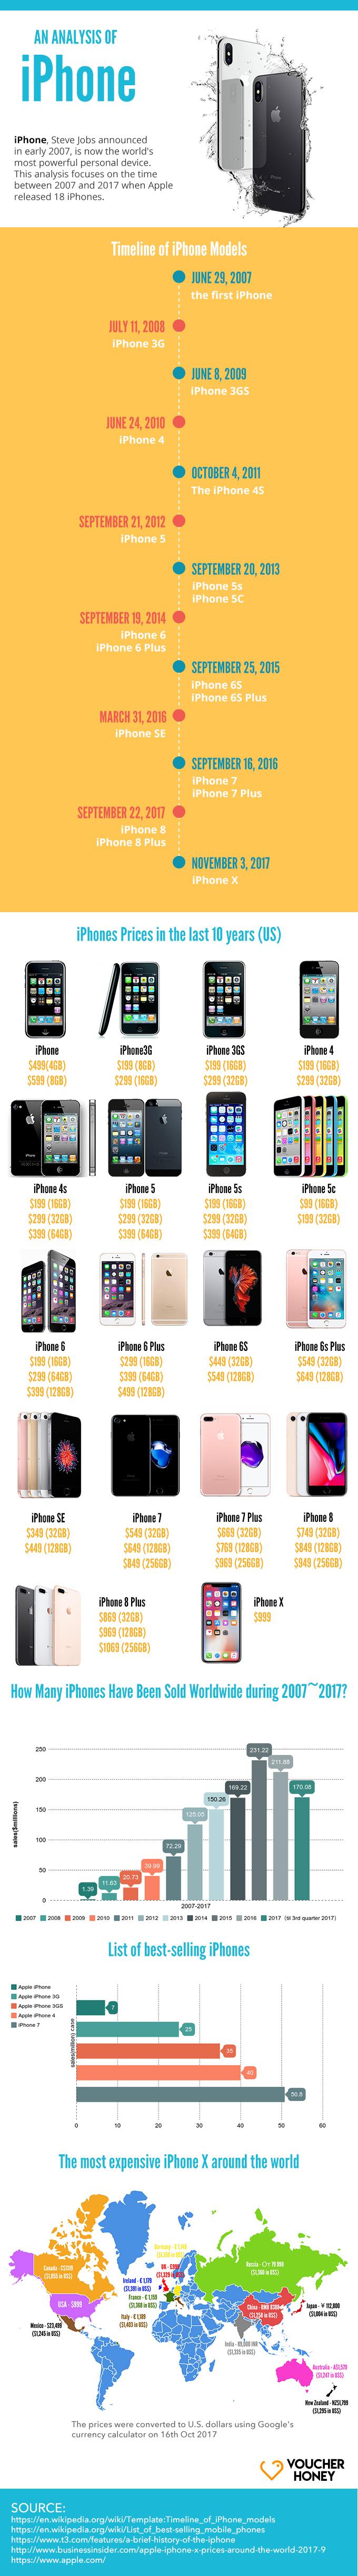 An Analysis of the iPhone by VoucherHoney